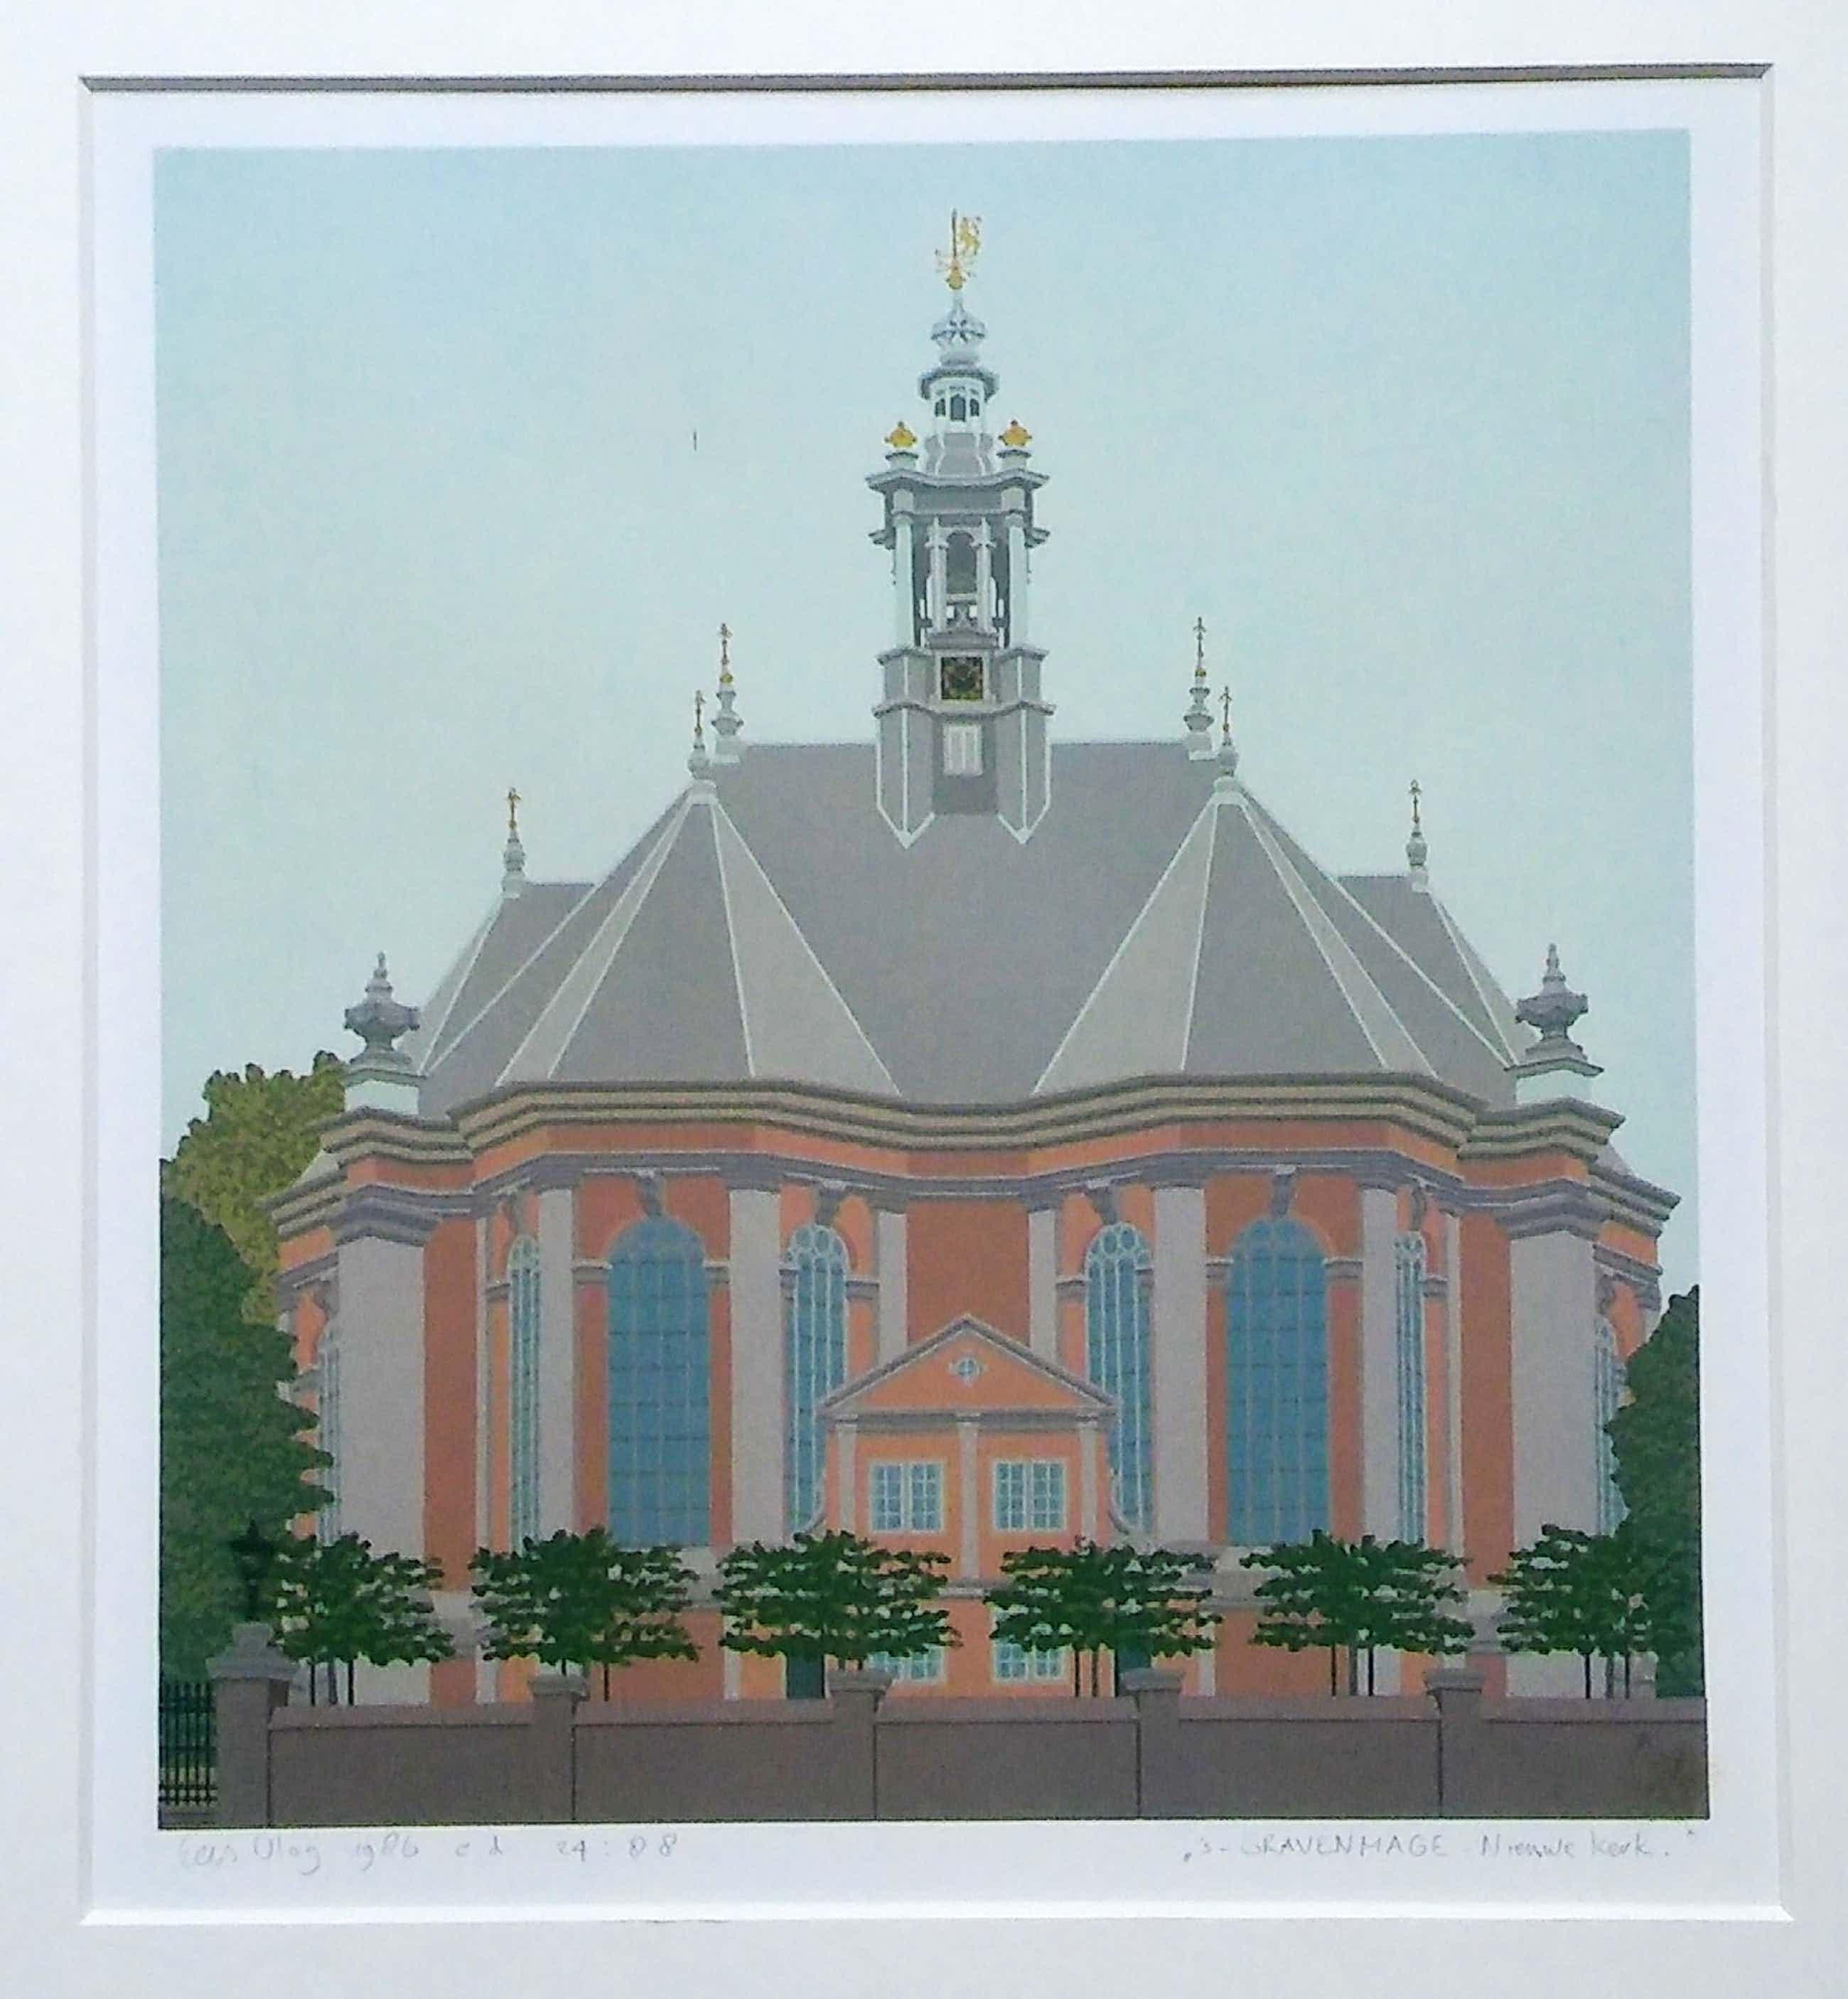 Sees Vlag - 's Gravenhage Nieuwe Kerk kopen? Bied vanaf 210!